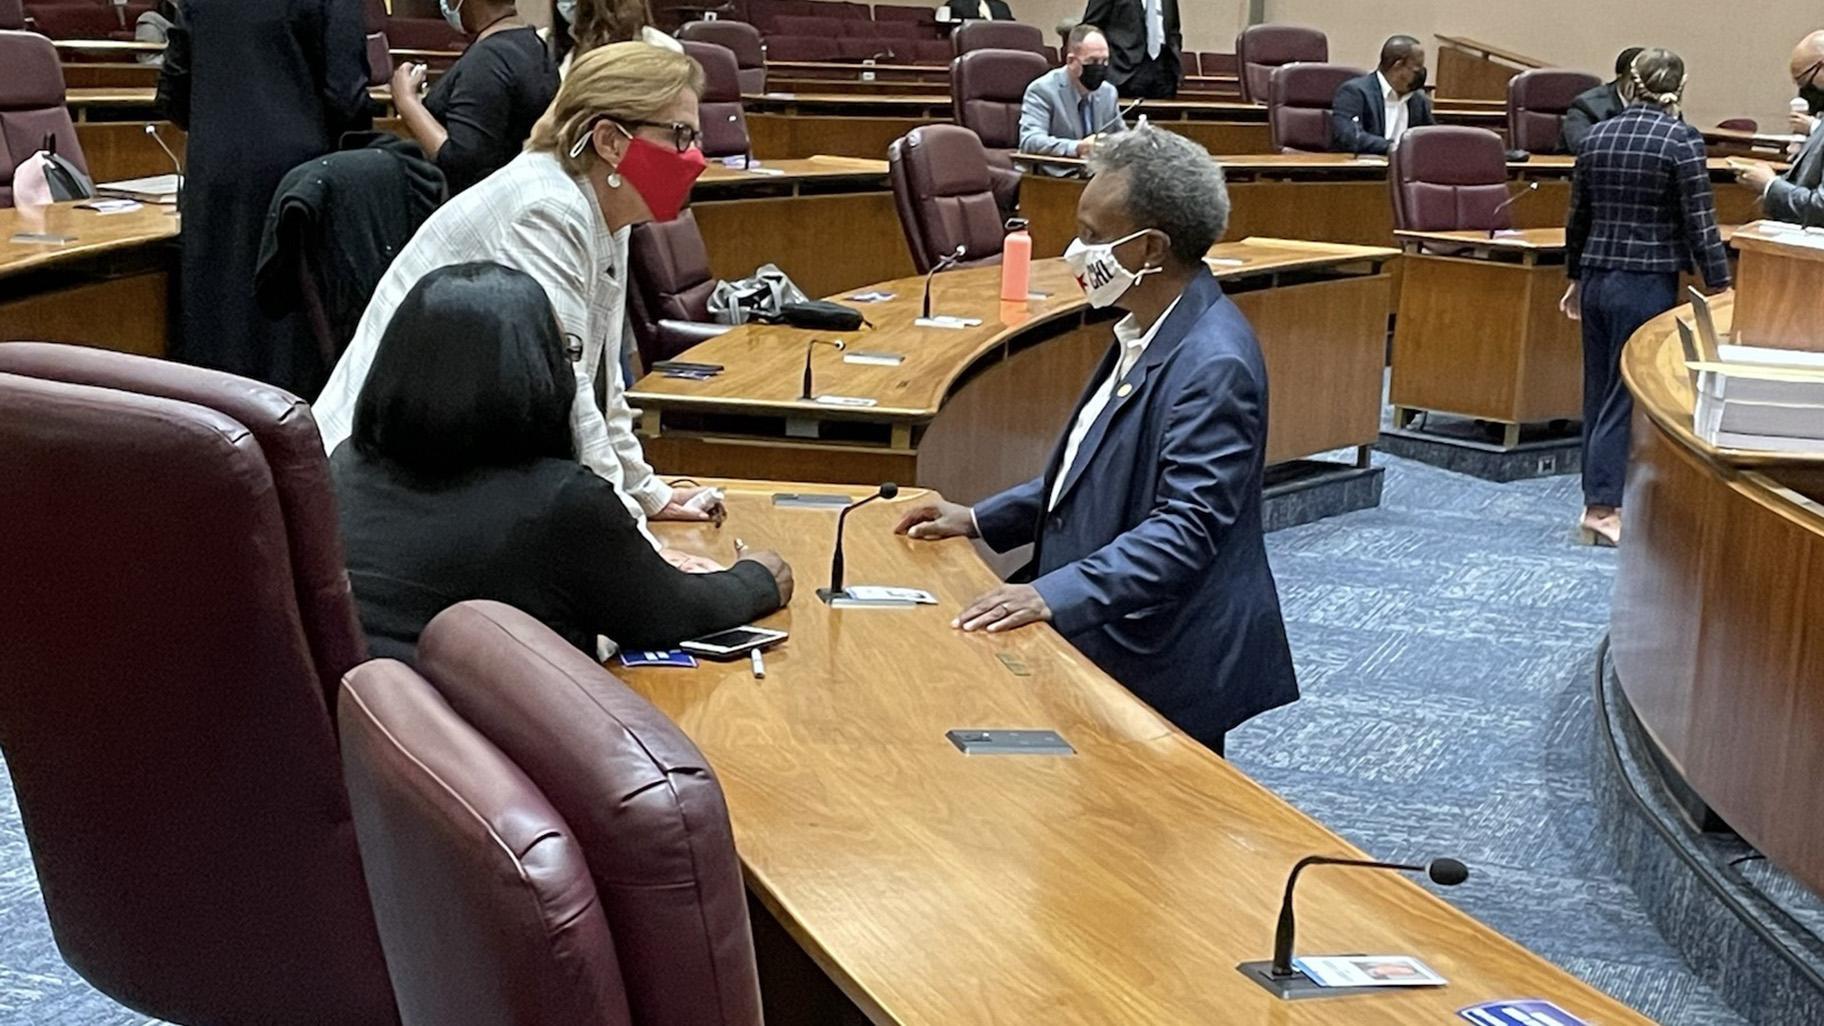 Mayor Lori Lightfoot speaks with Alds.  Susan Sadlowski Garza (10th Ward) and Emma Mitts (37th Ward) before detailing her 2022 spending plan on Monday, September 20, 2021 (Heather Cherone / WTTW News)